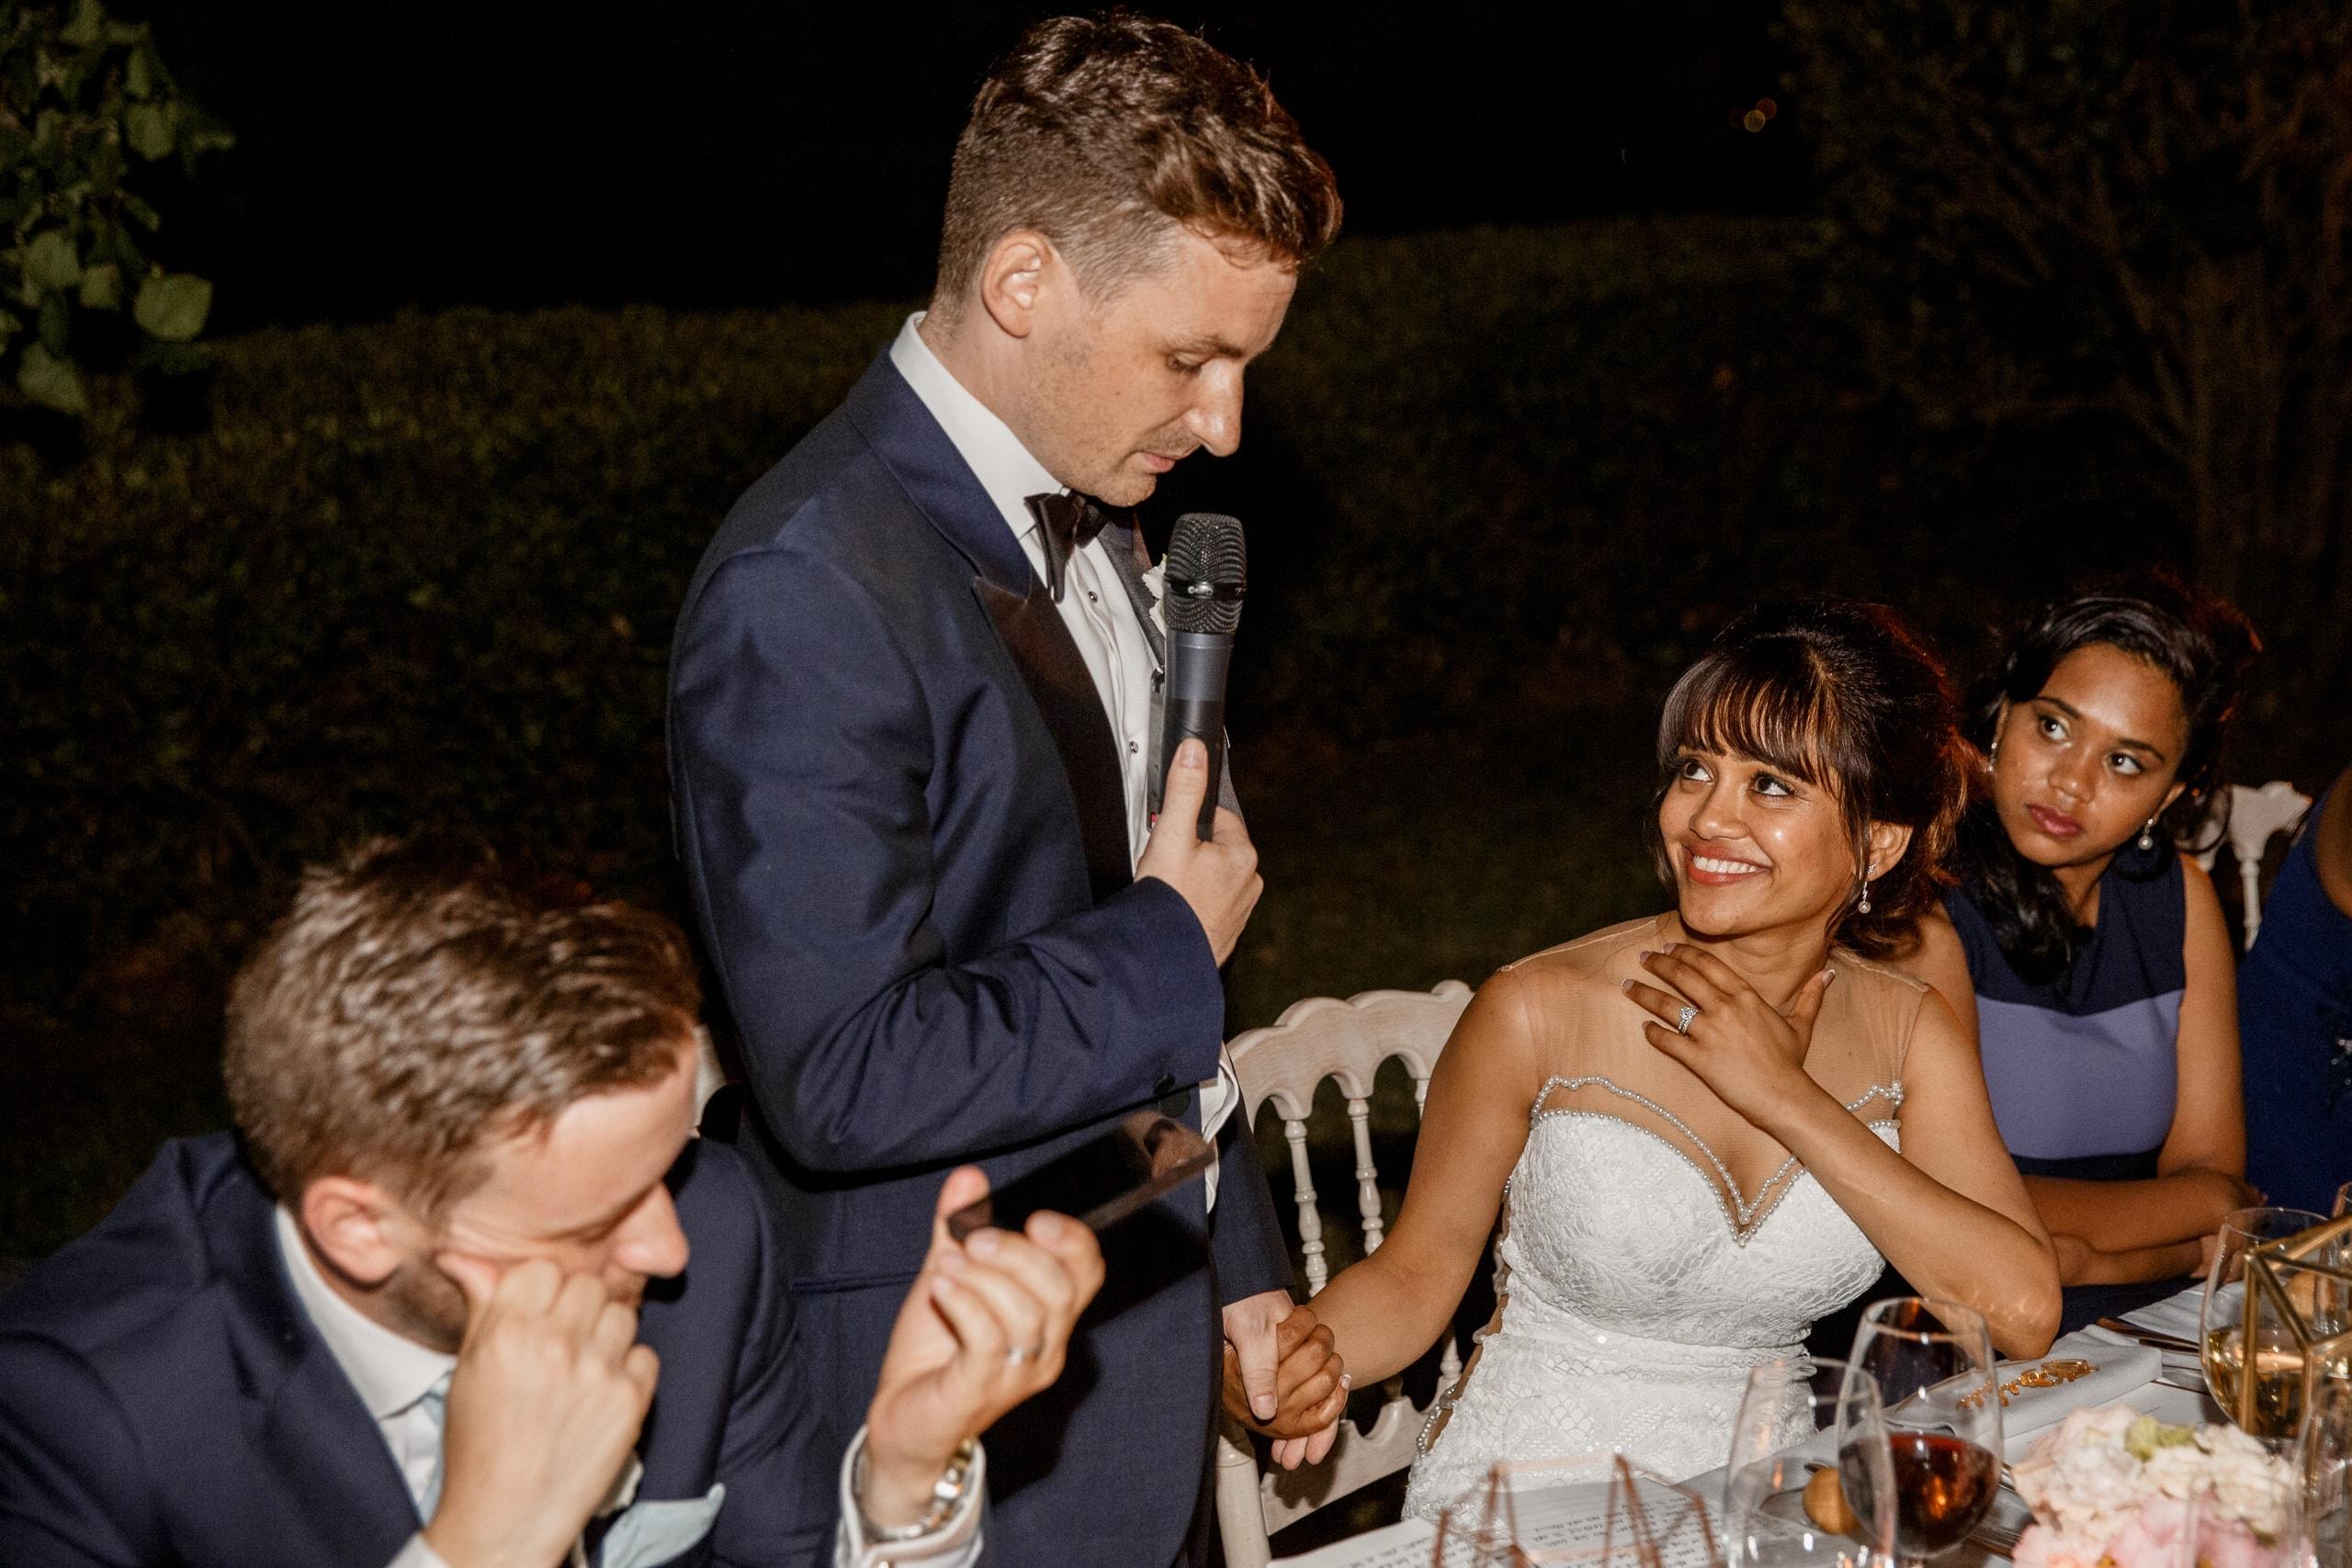 wedding speeches at villa del balbianello